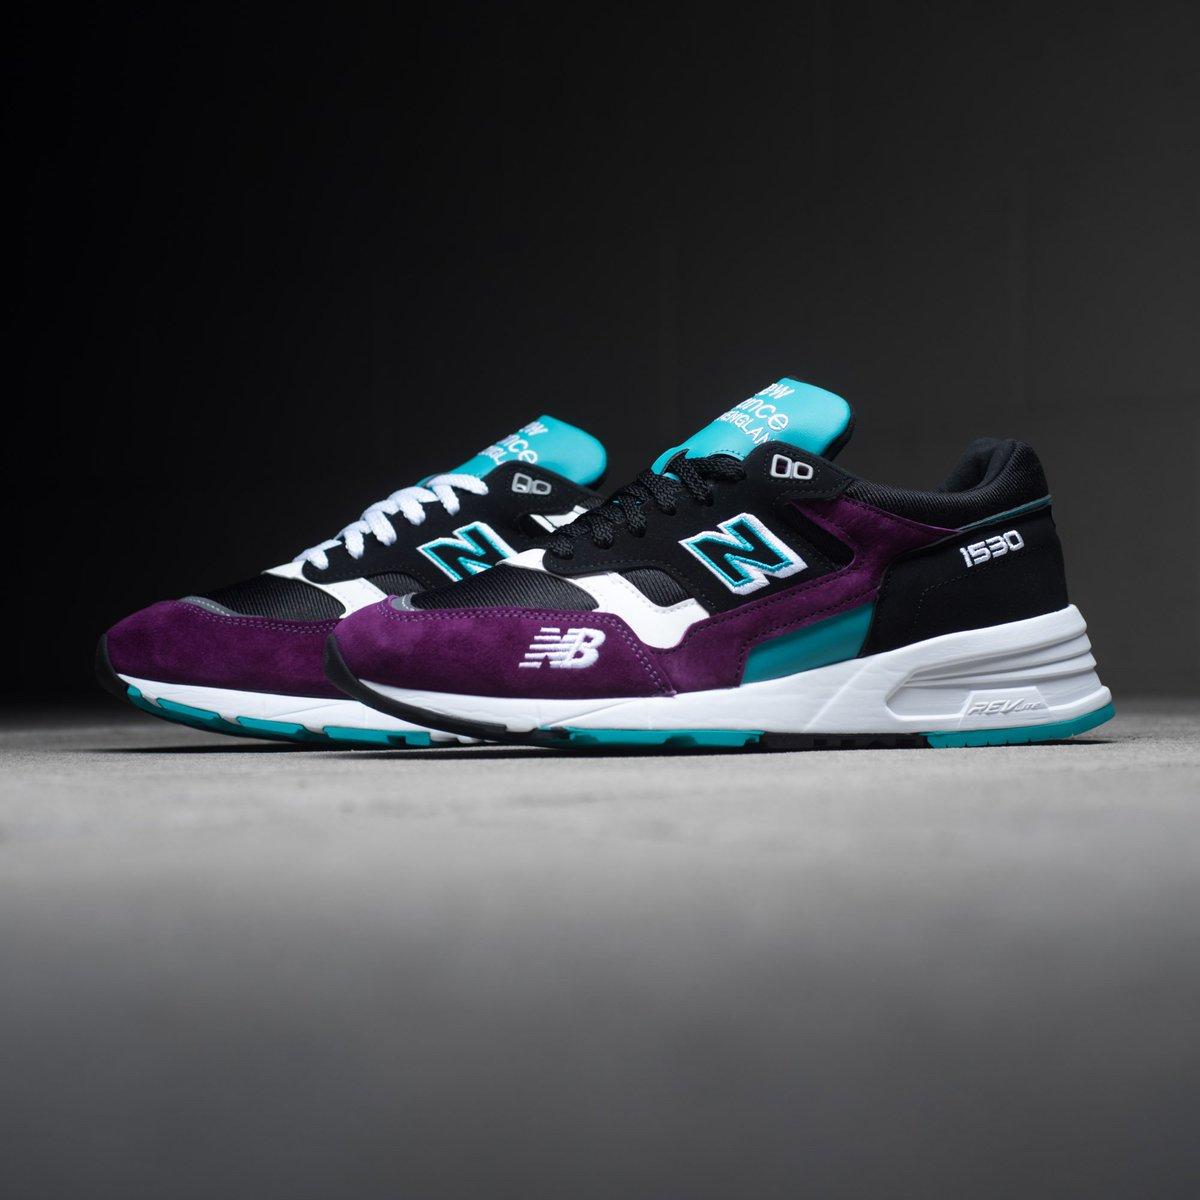 c611c41ed6ad Now Available    New Balance M1530KPT - Black Purple    https    sneakerpolitics.com products new-balance-m1530kpt-black-purple  …pic.twitter.com ky5ape2du9